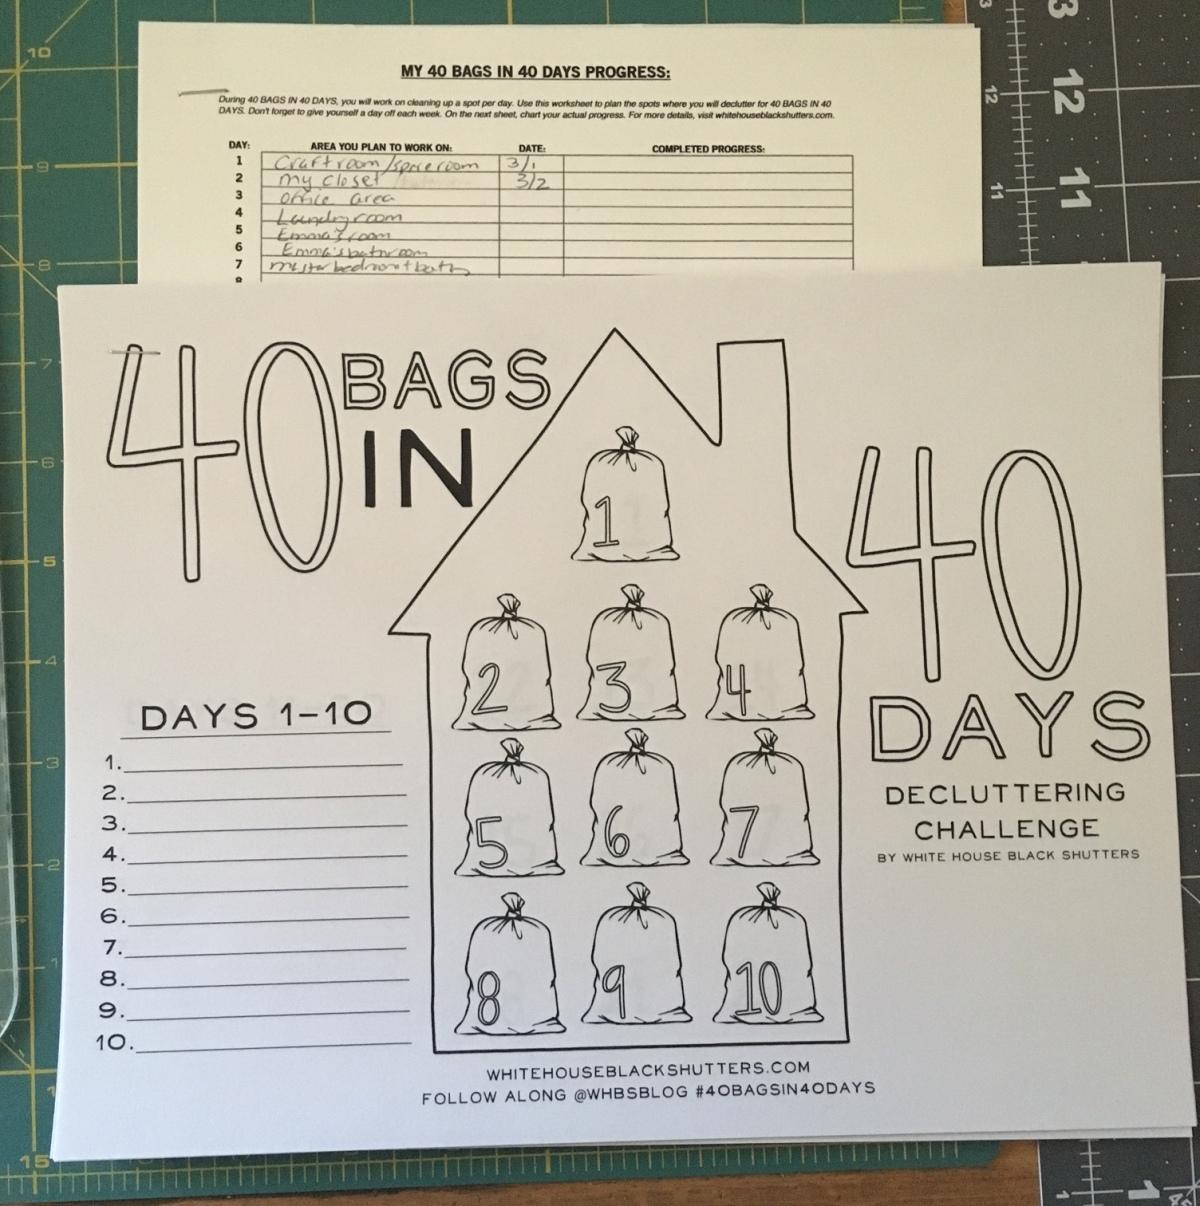 40 Bags Challenge